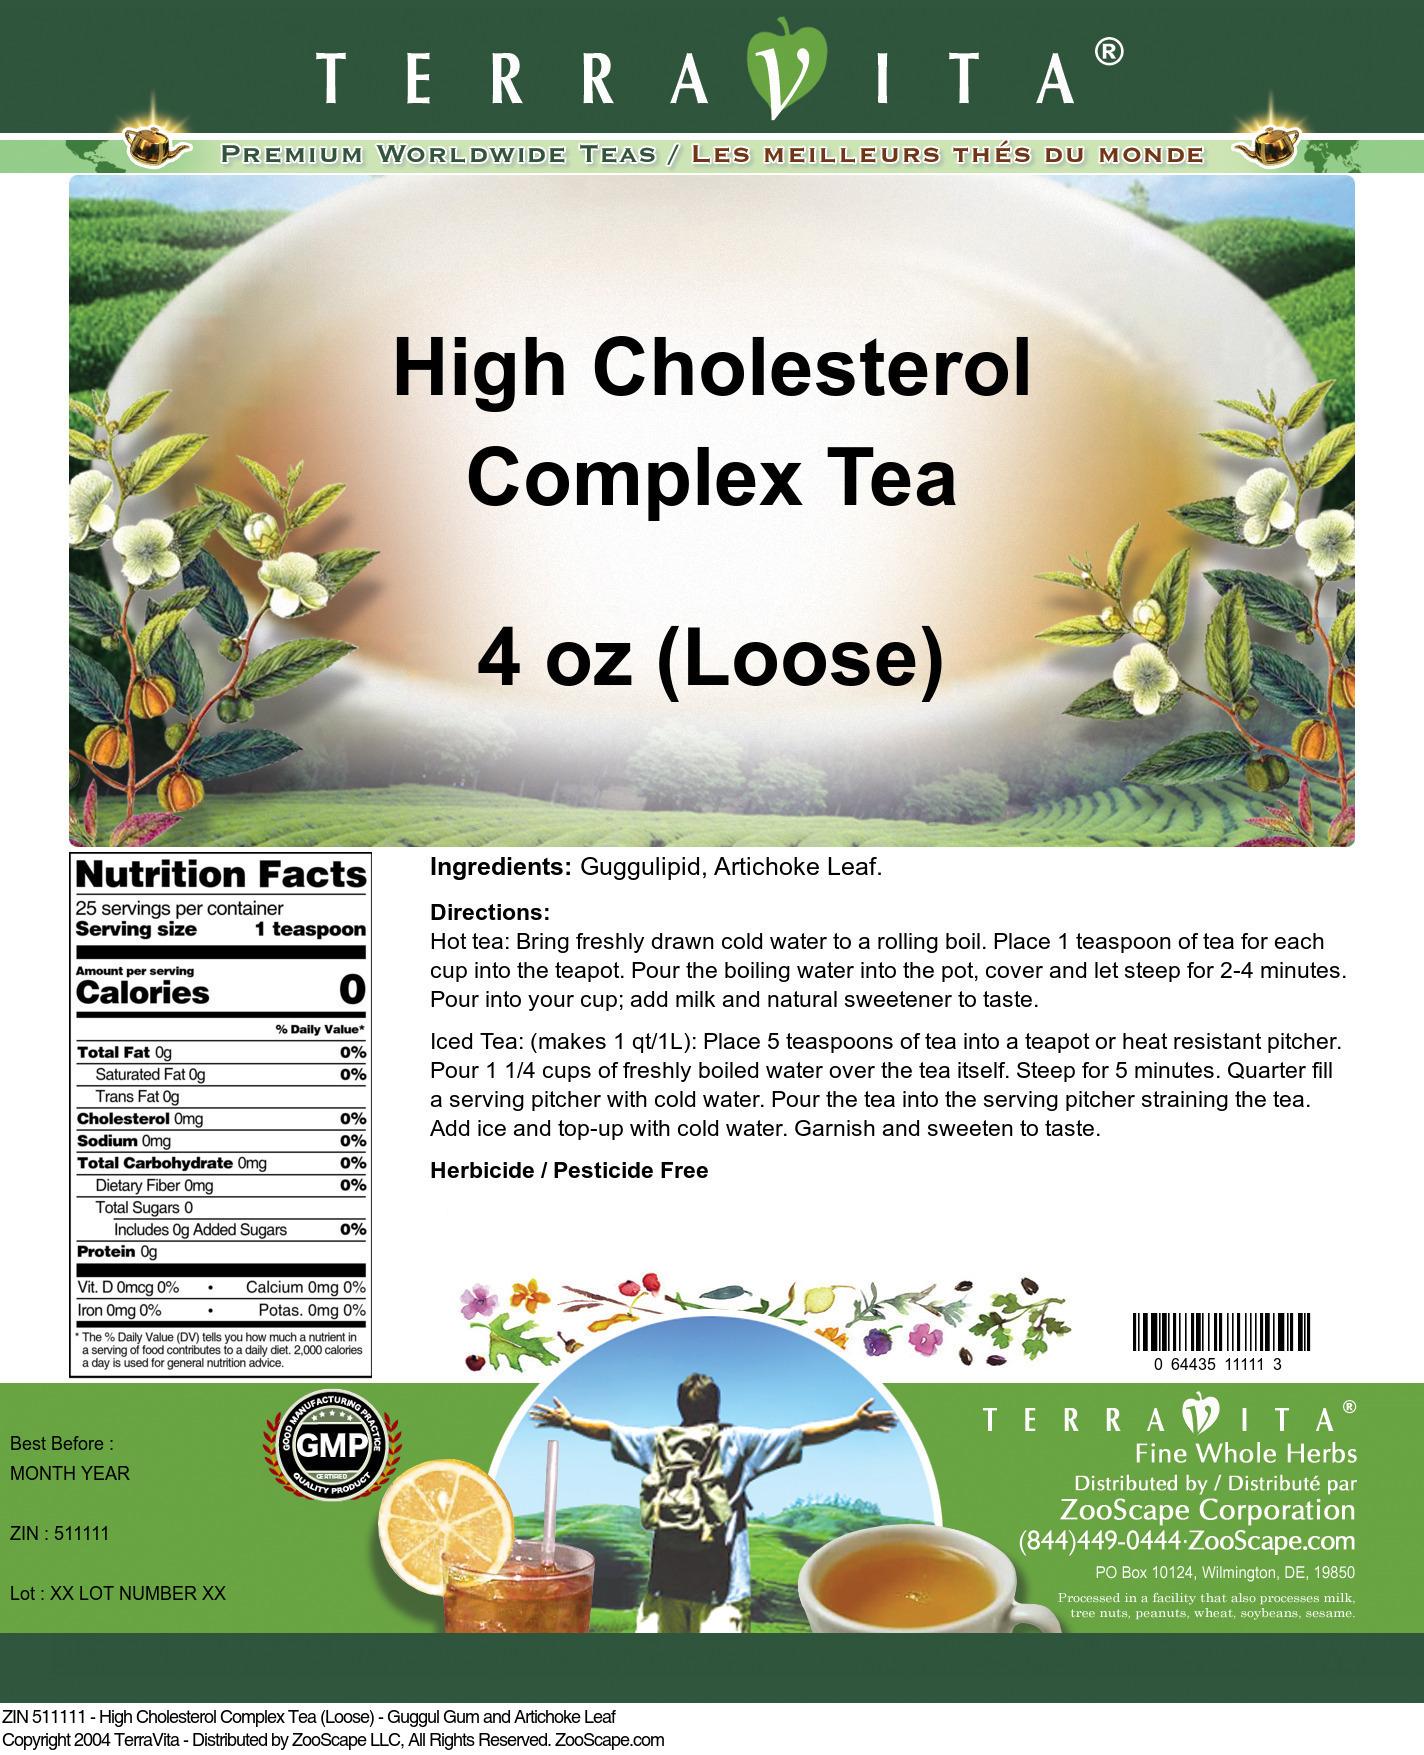 High Cholesterol Complex